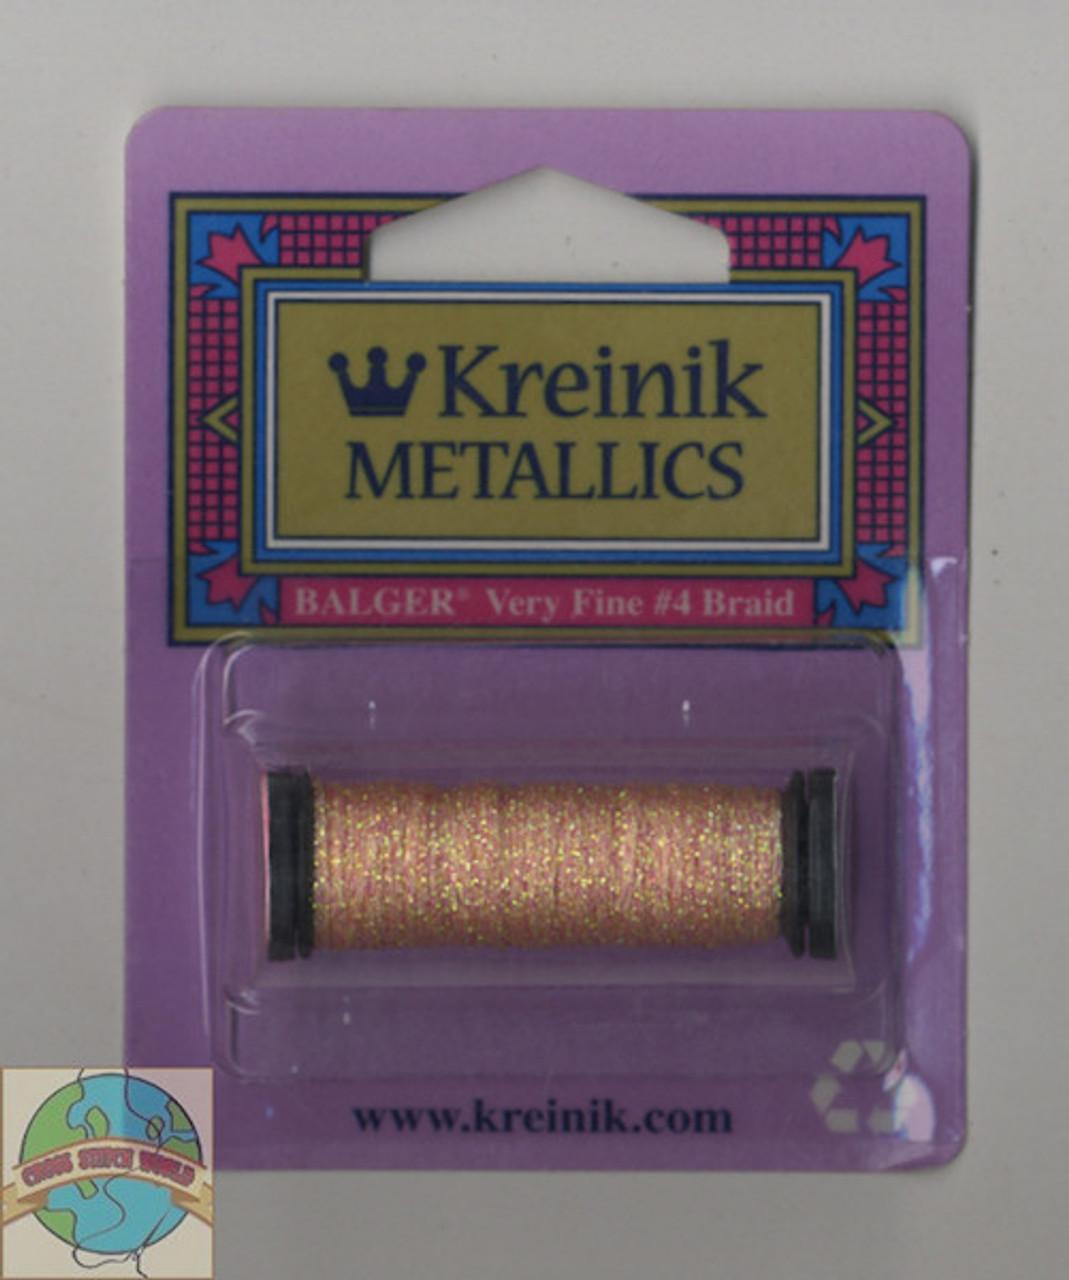 Kreinik Metallics - Very Fine #4 Light Peach 9192